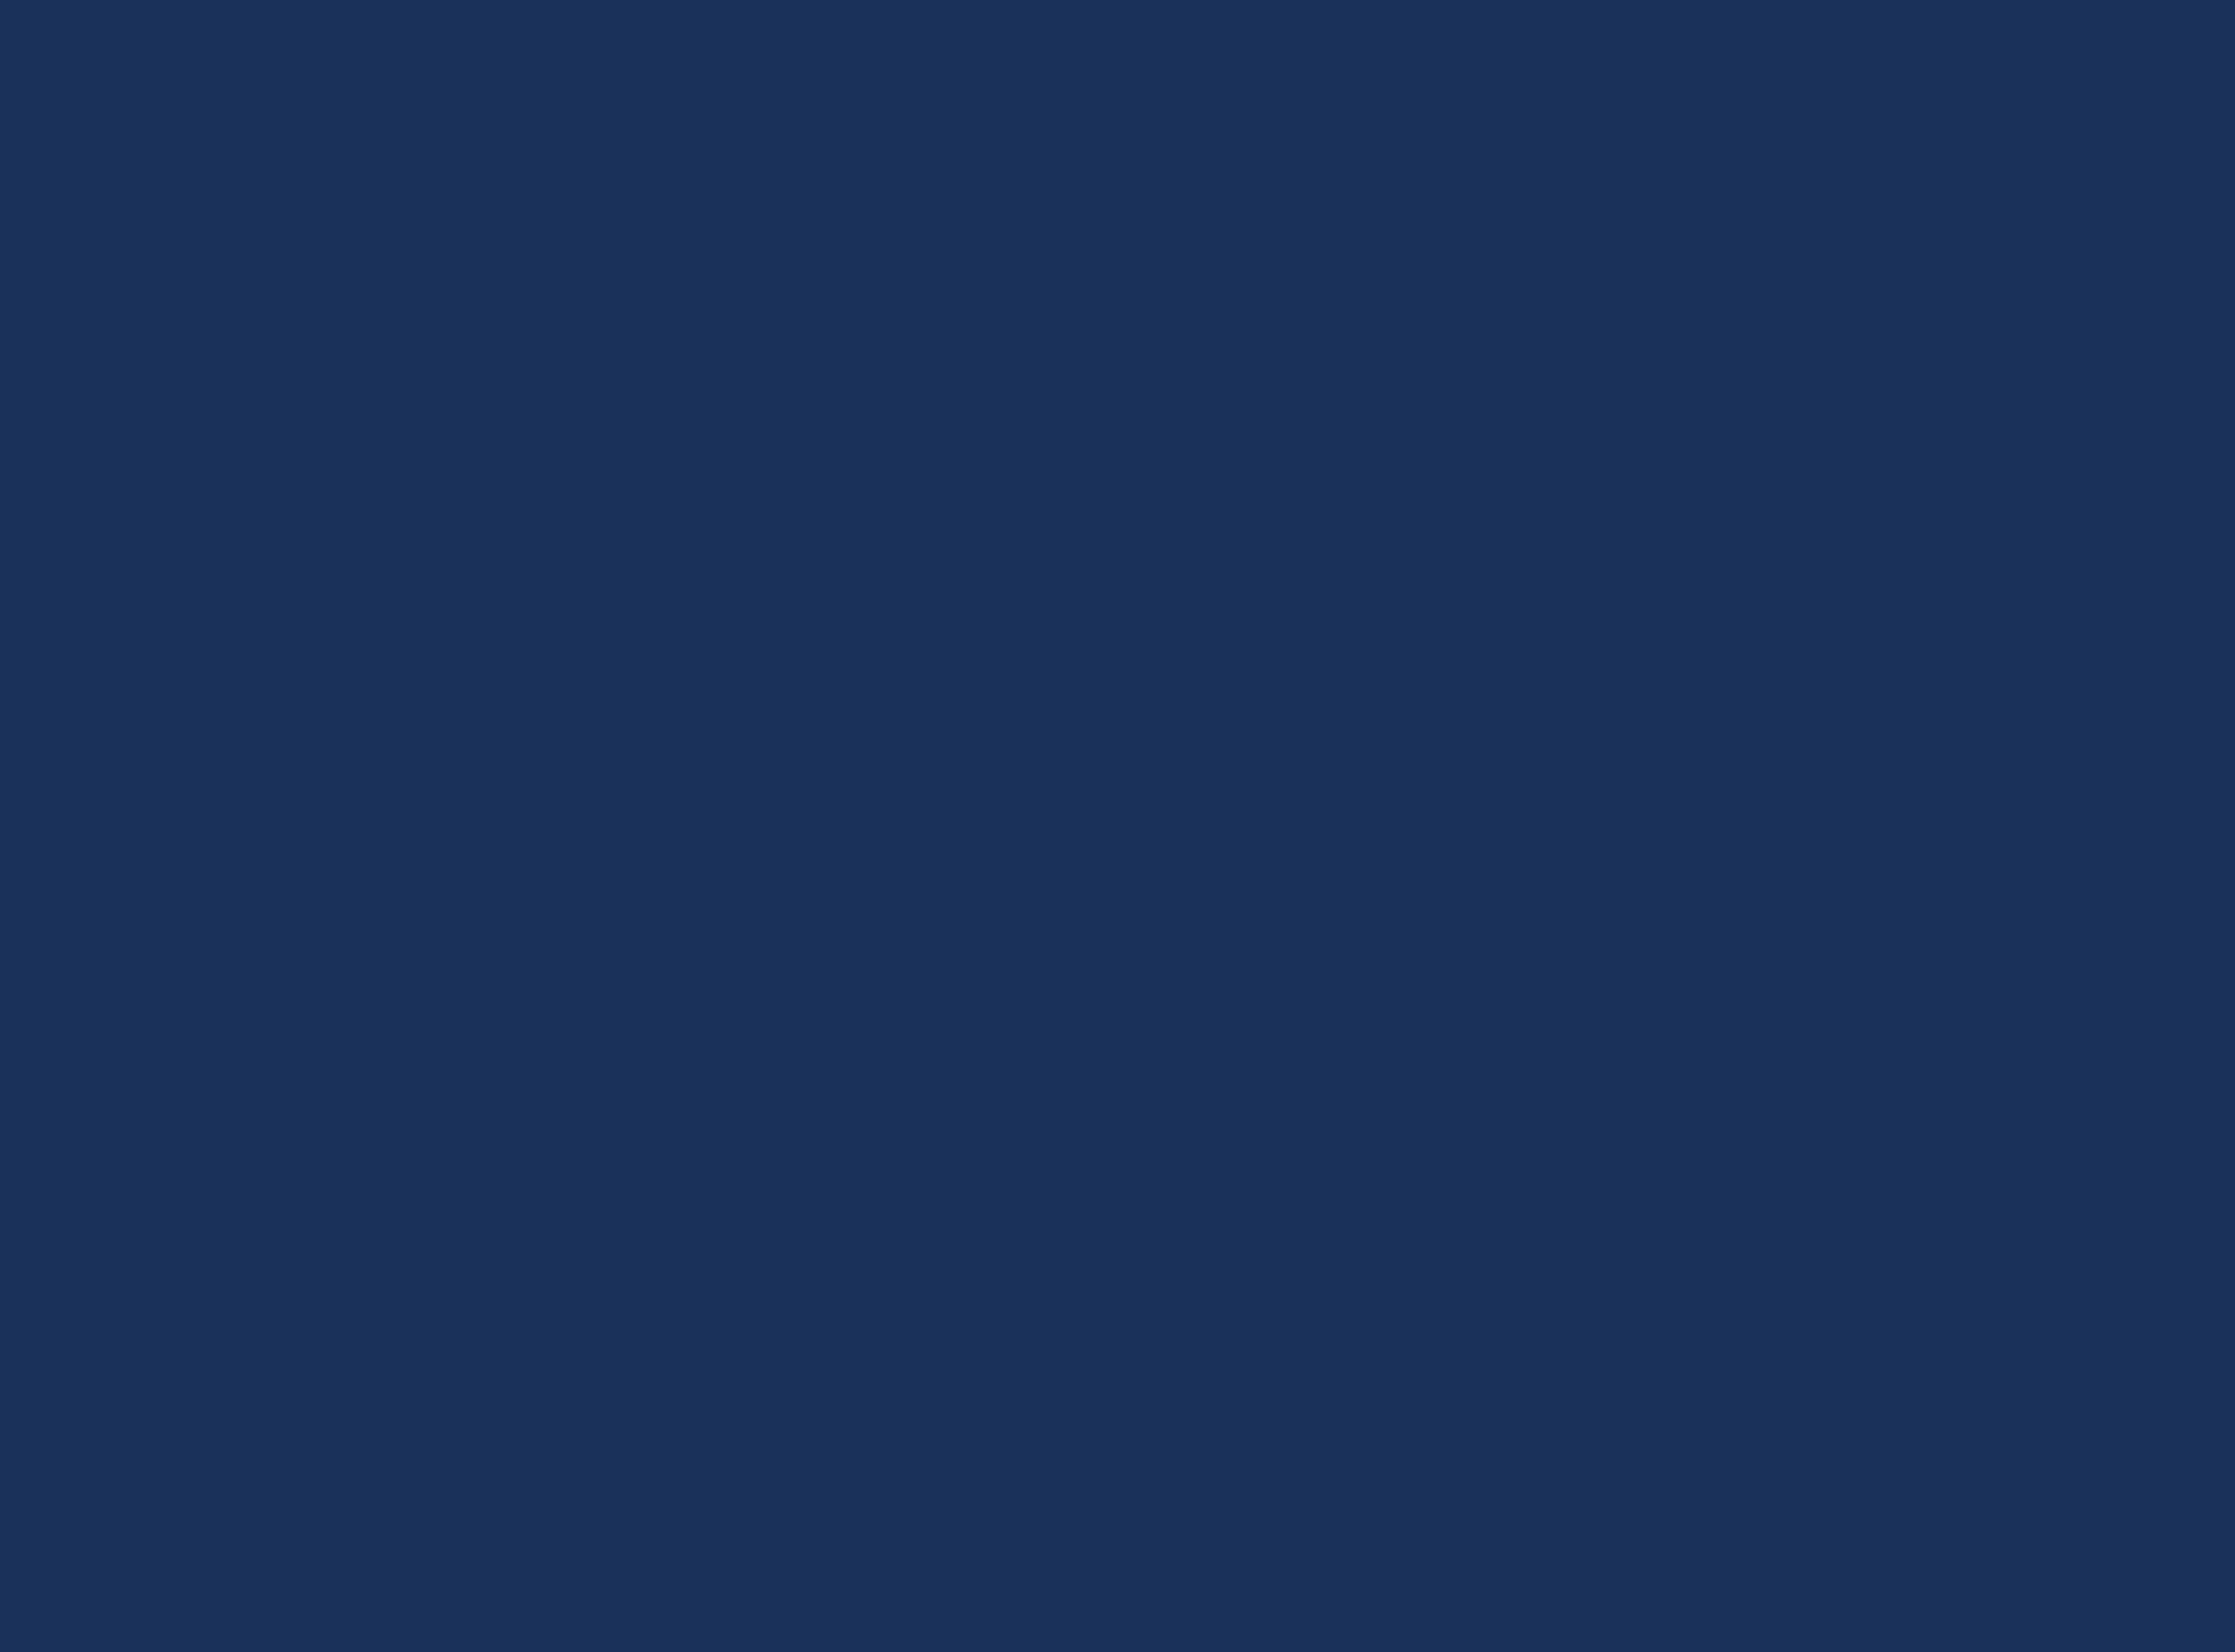 Blue banner